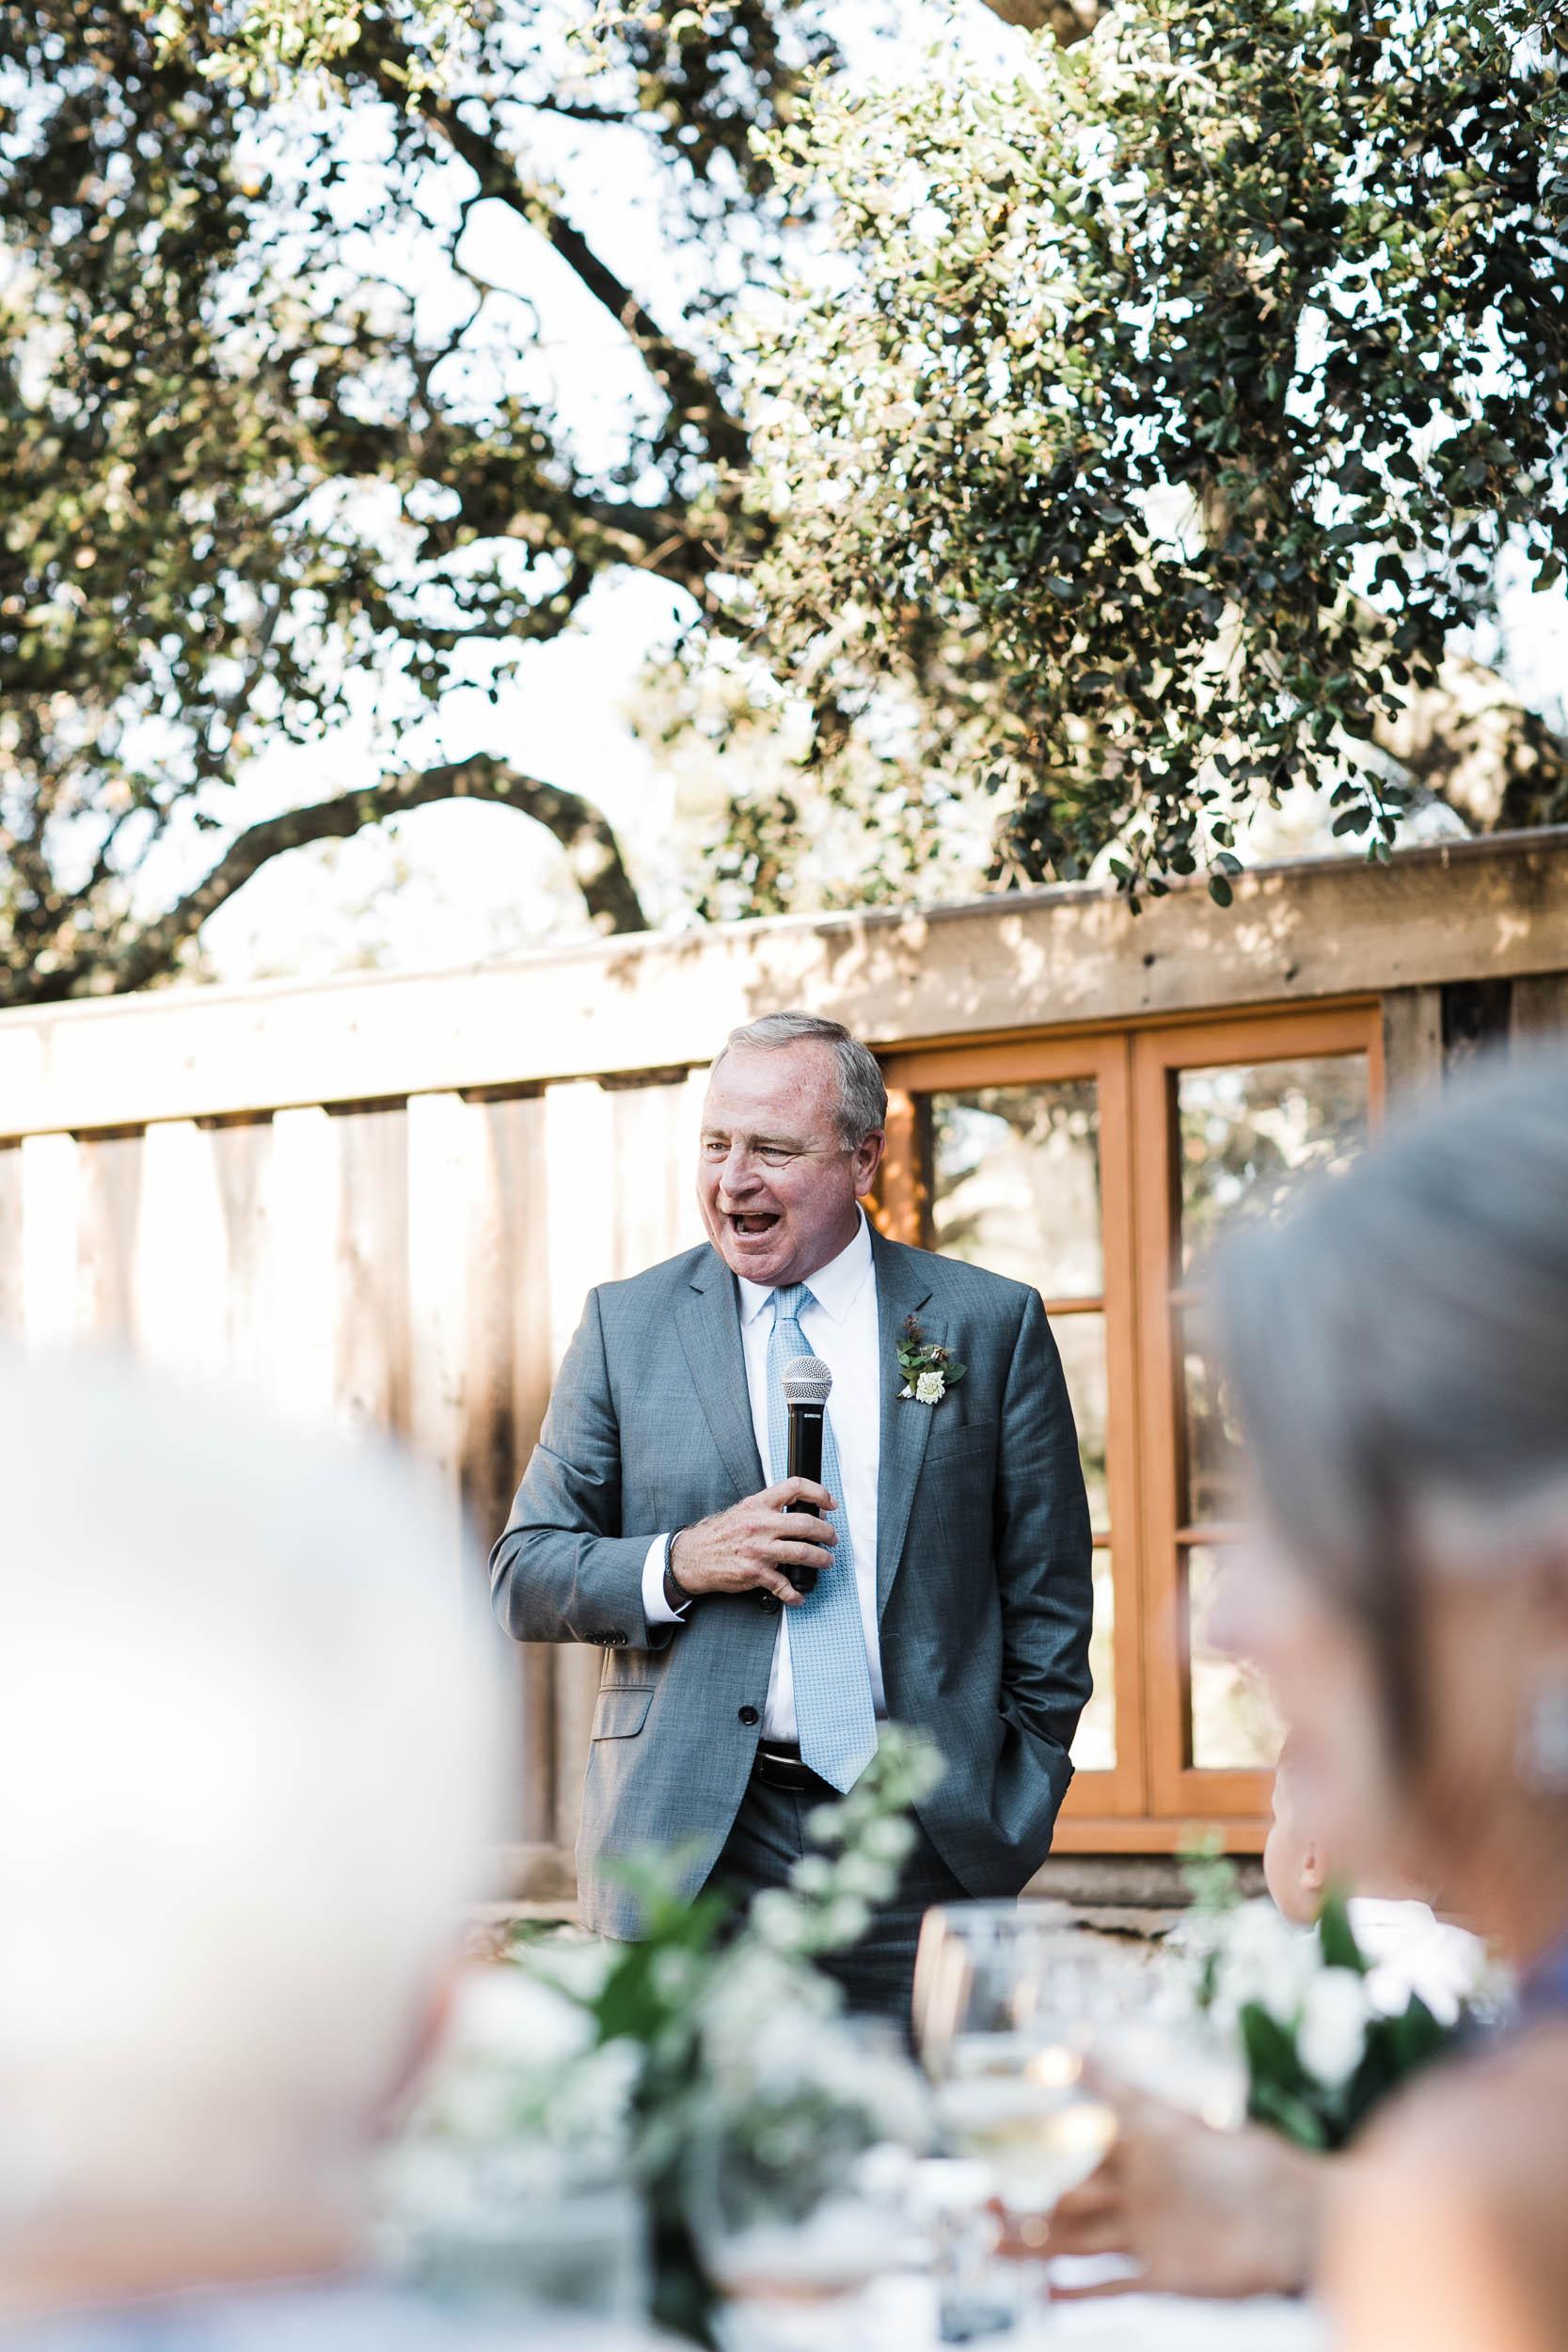 086_072118_D+K_Holman Ranch Wedding_Buena Lane Photography_1024ER.jpg